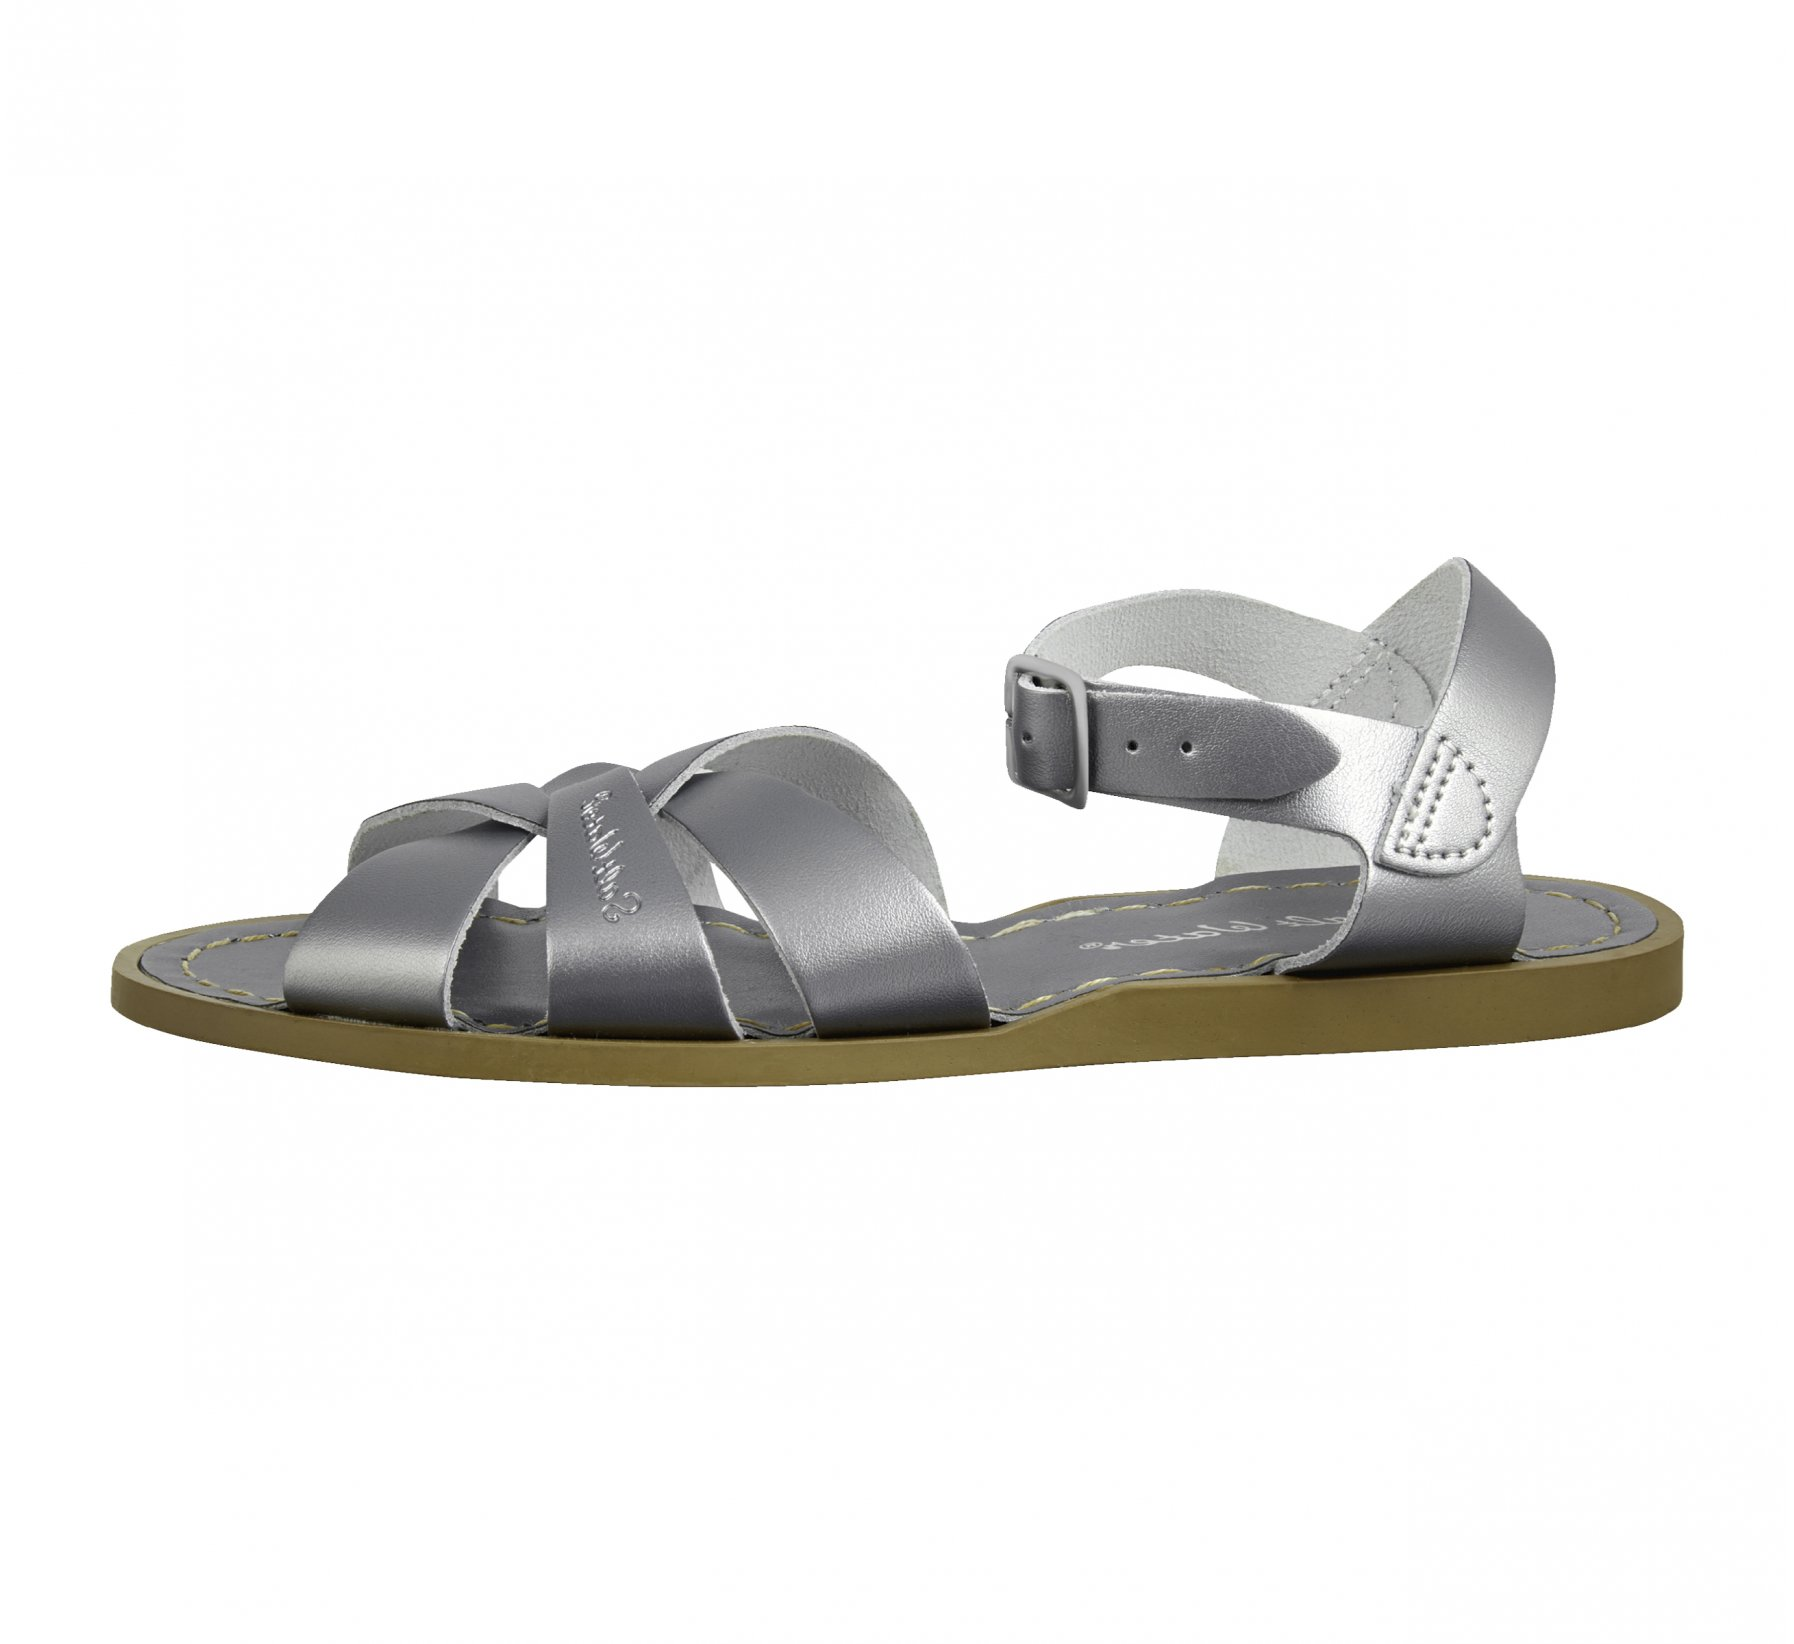 Original Gris Acier - Salt Water Sandals